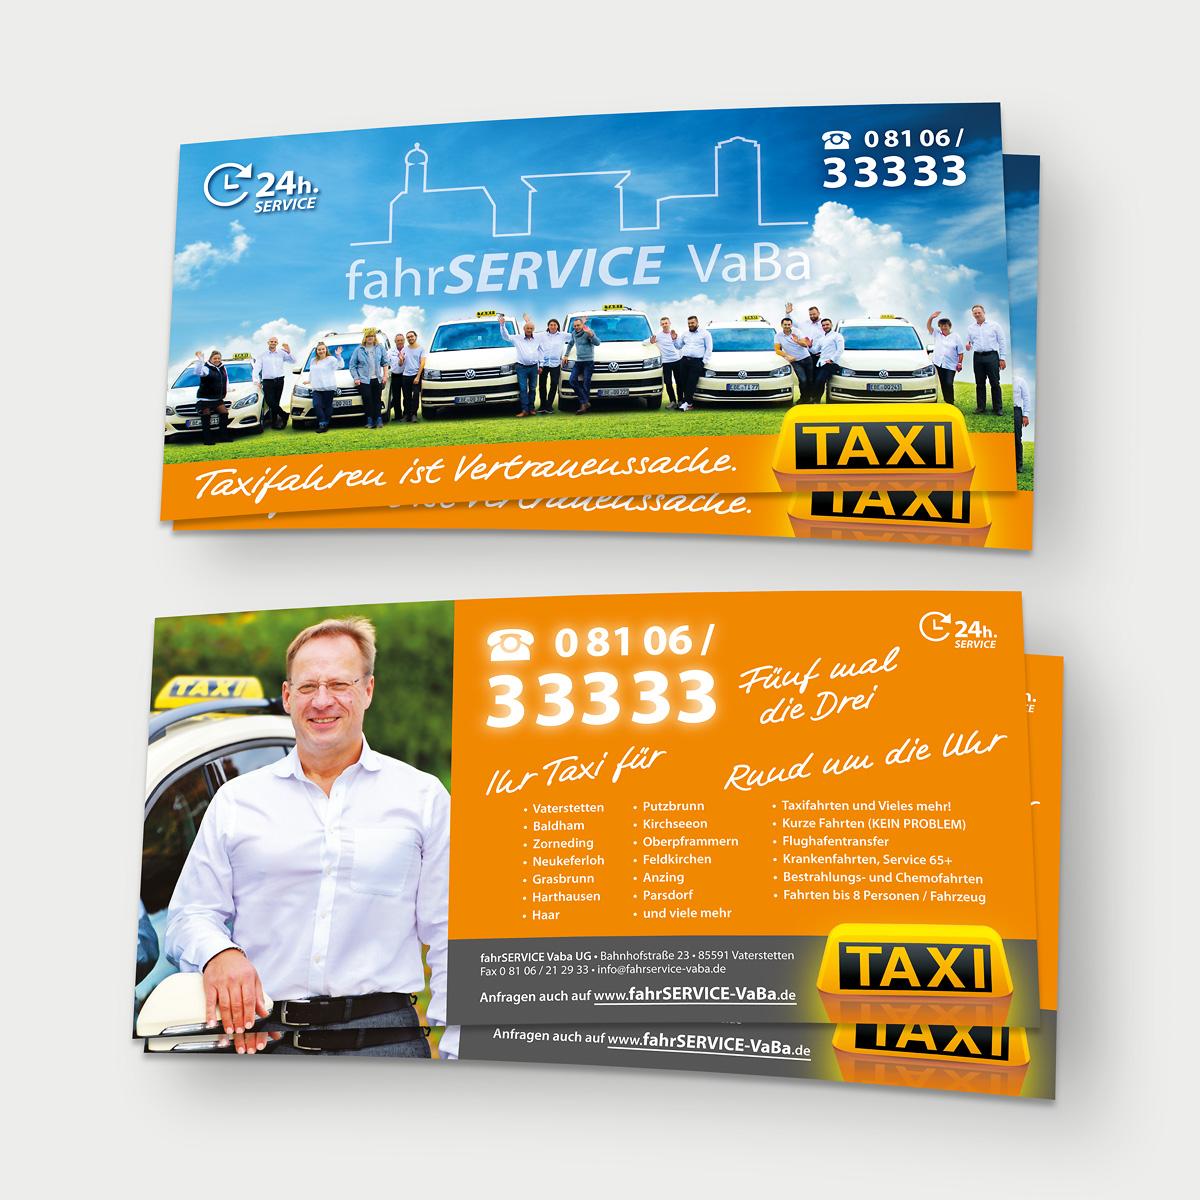 fahrSERVICE-VaBa-Flyer